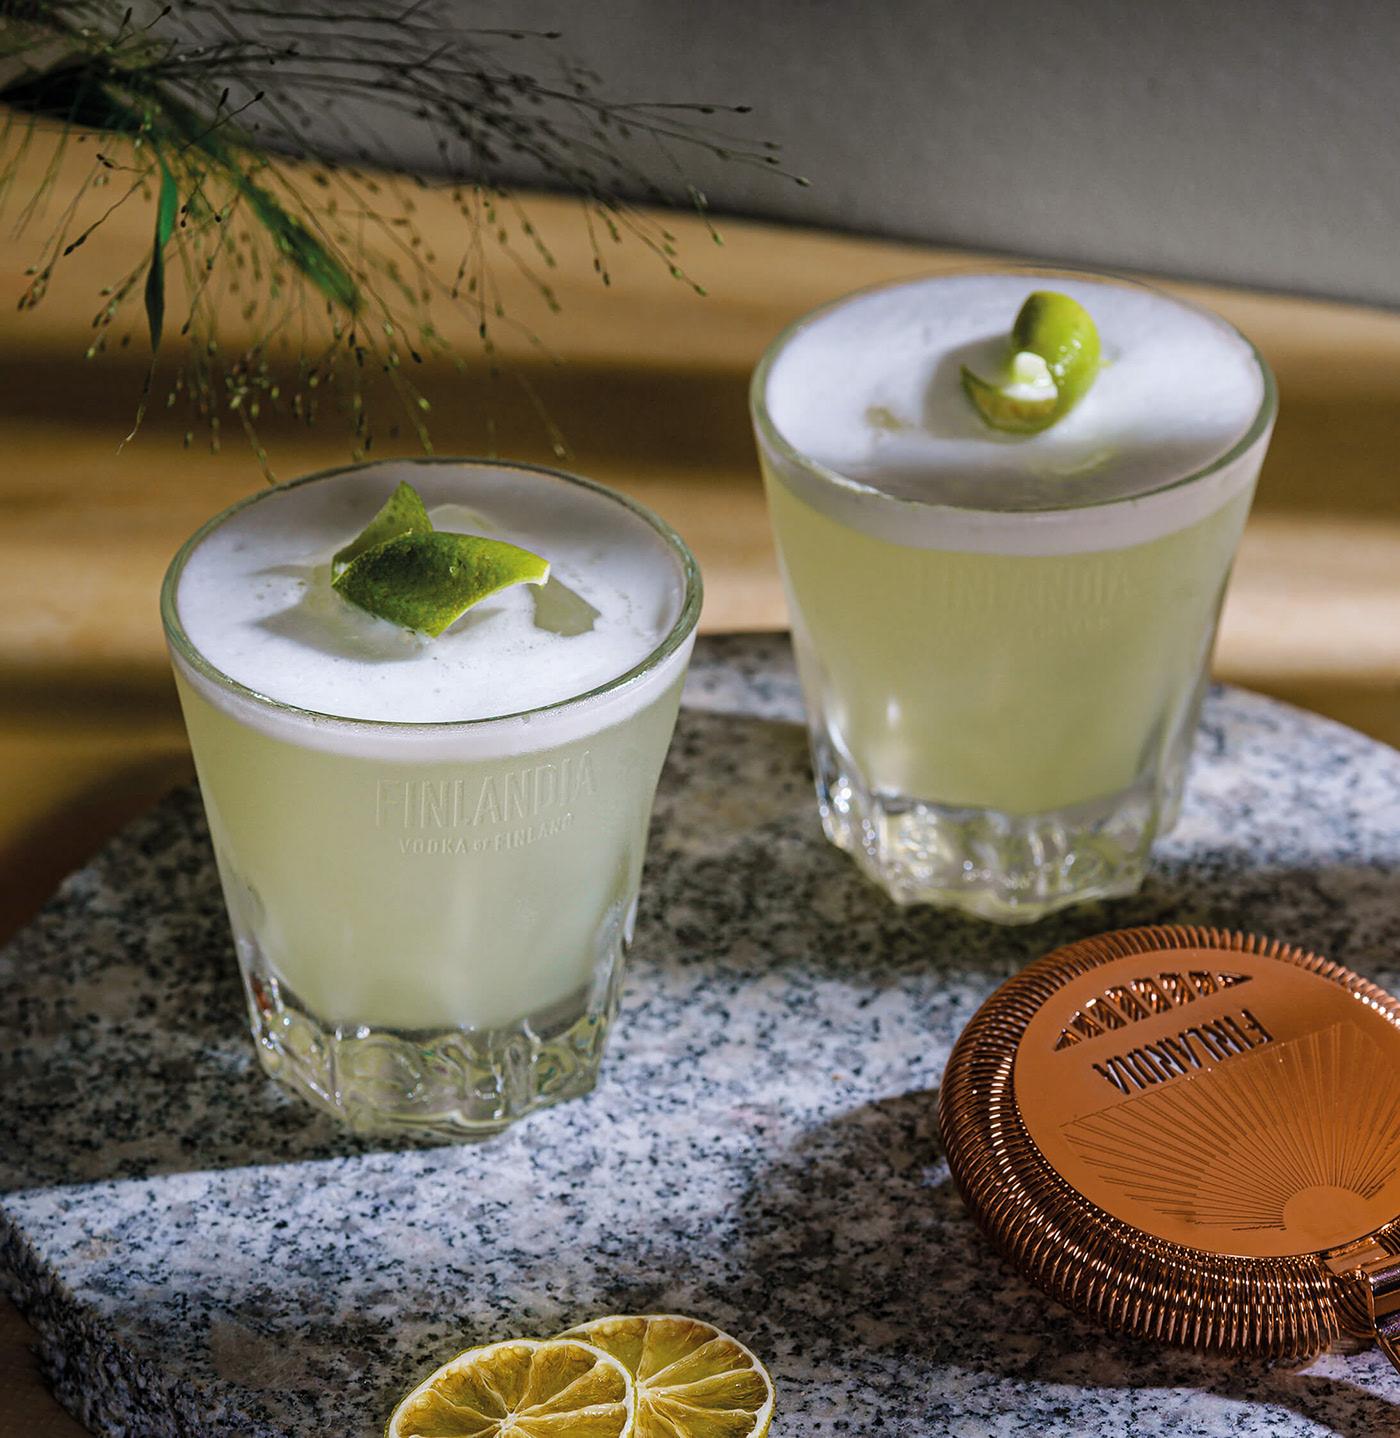 Finlandia Vodka Cocktails